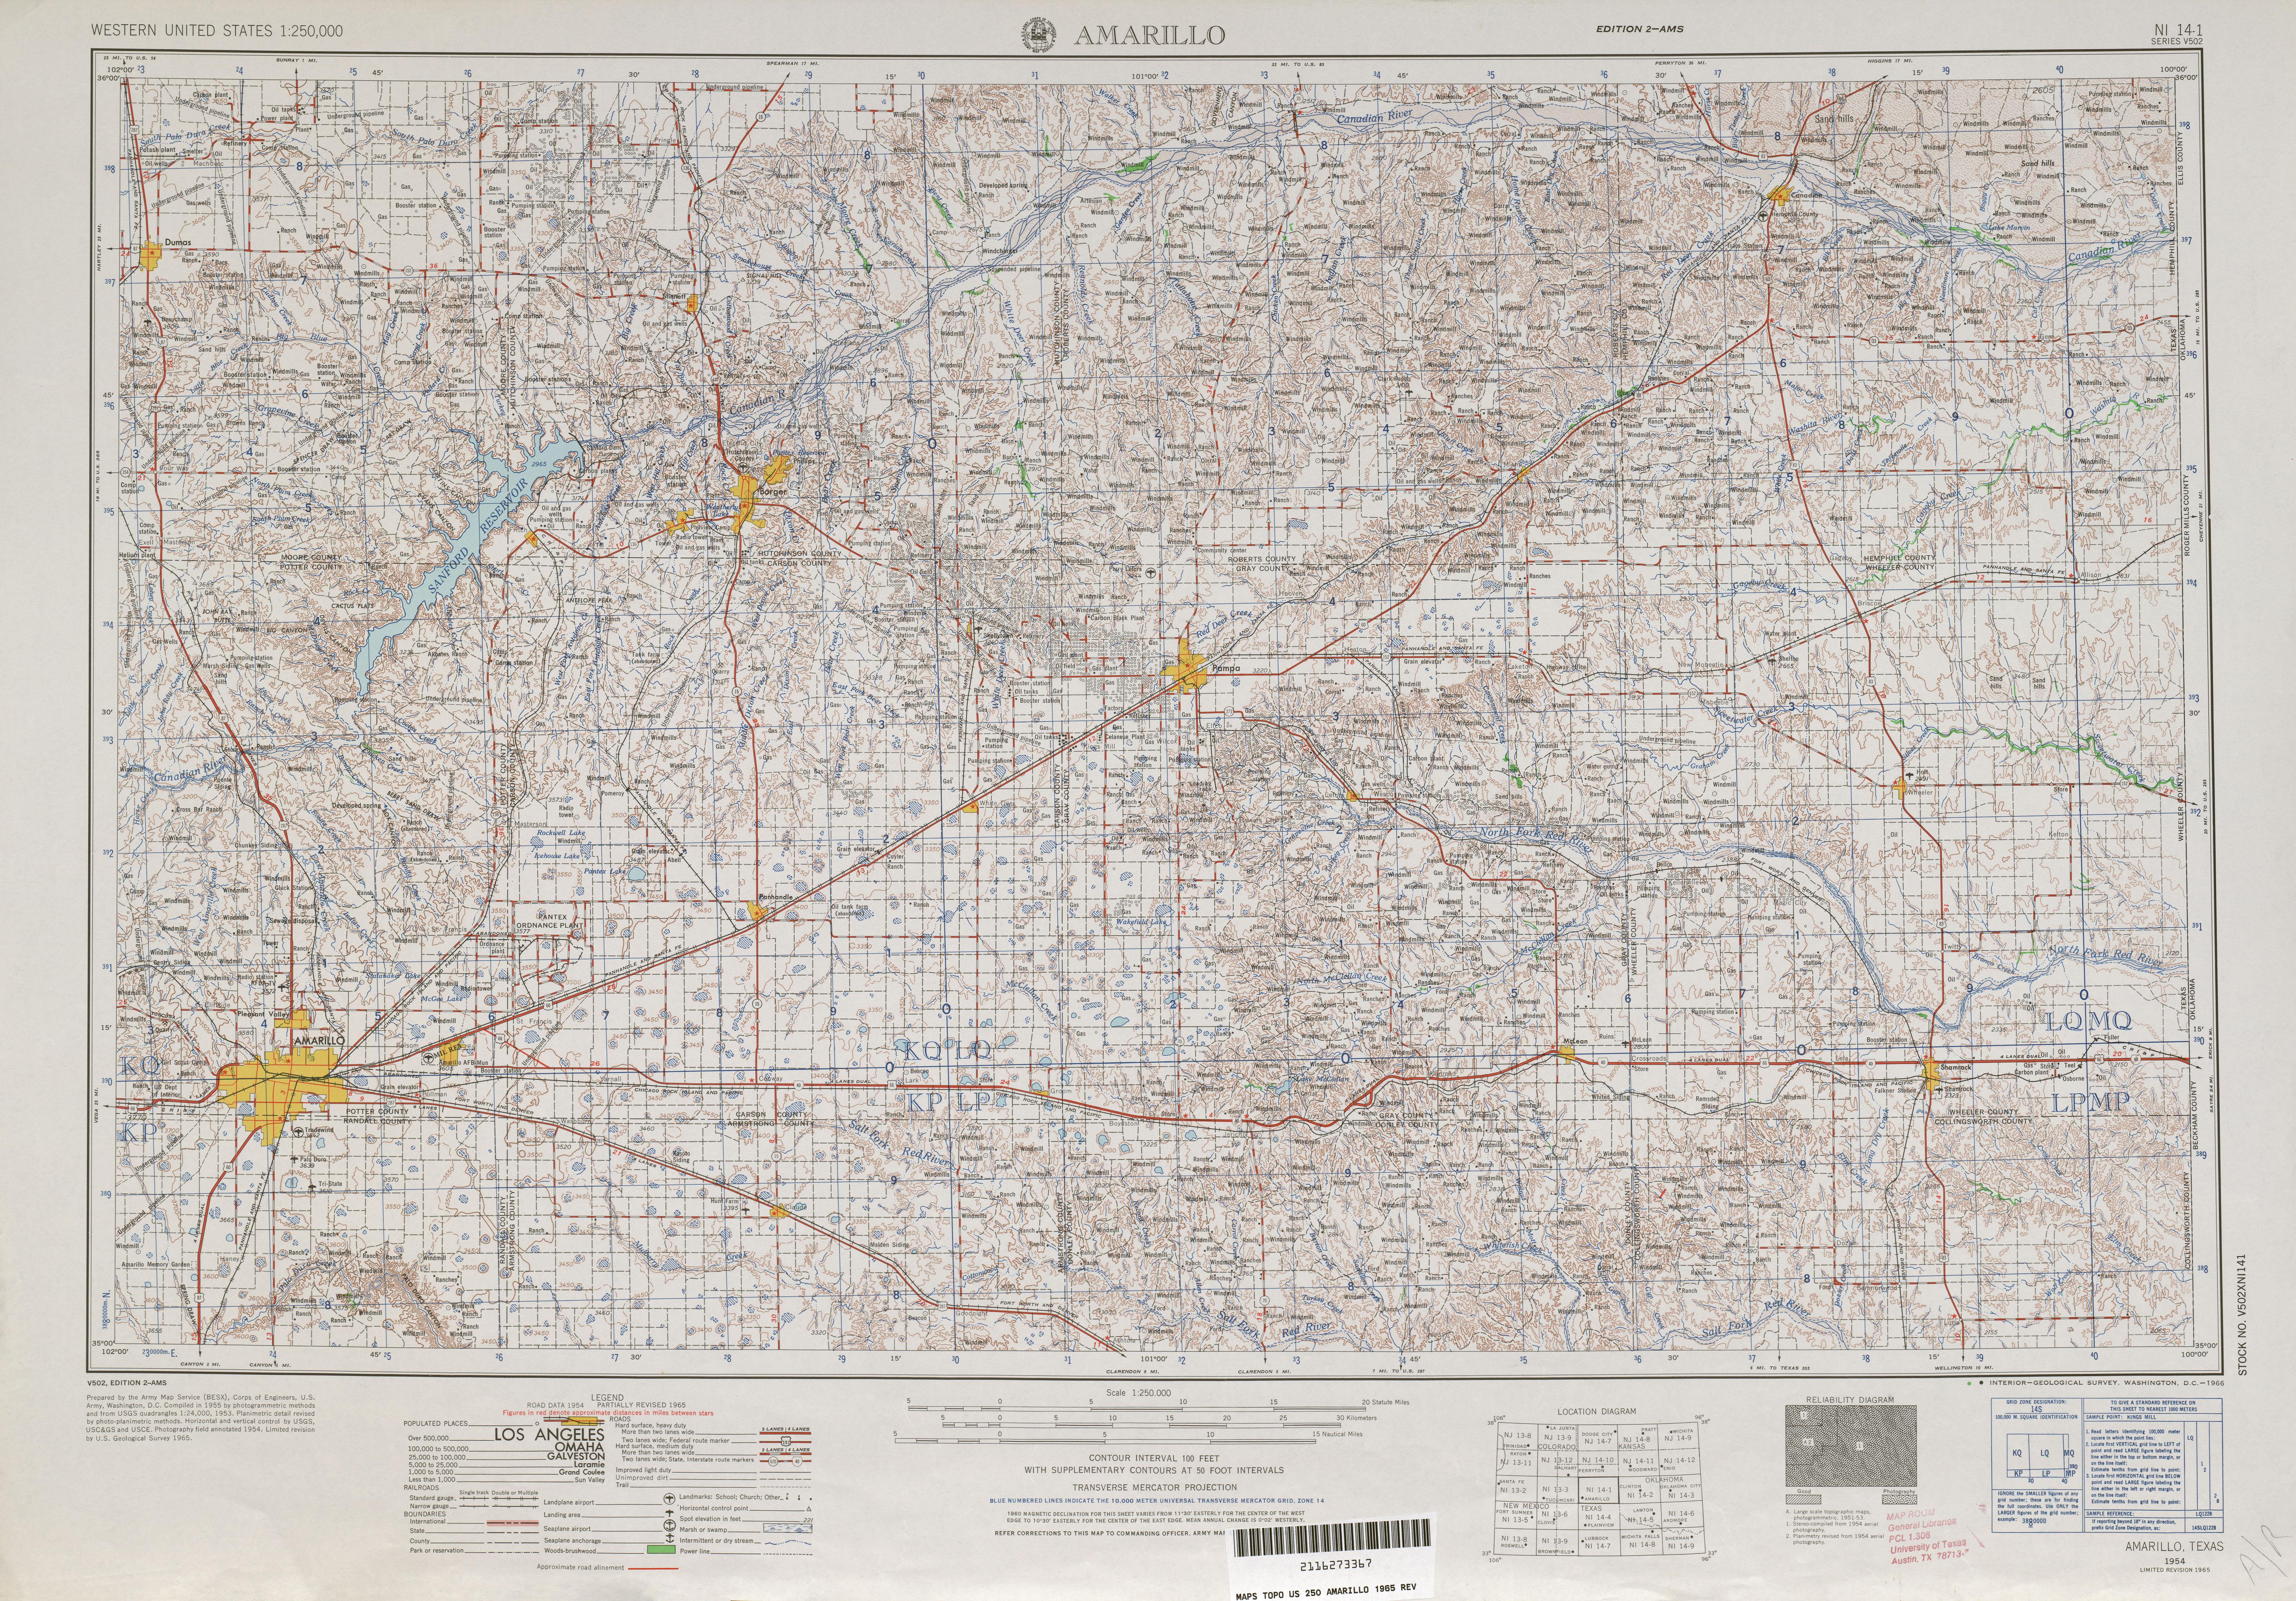 Amarillo Topographic Map Sheet, United States 1965